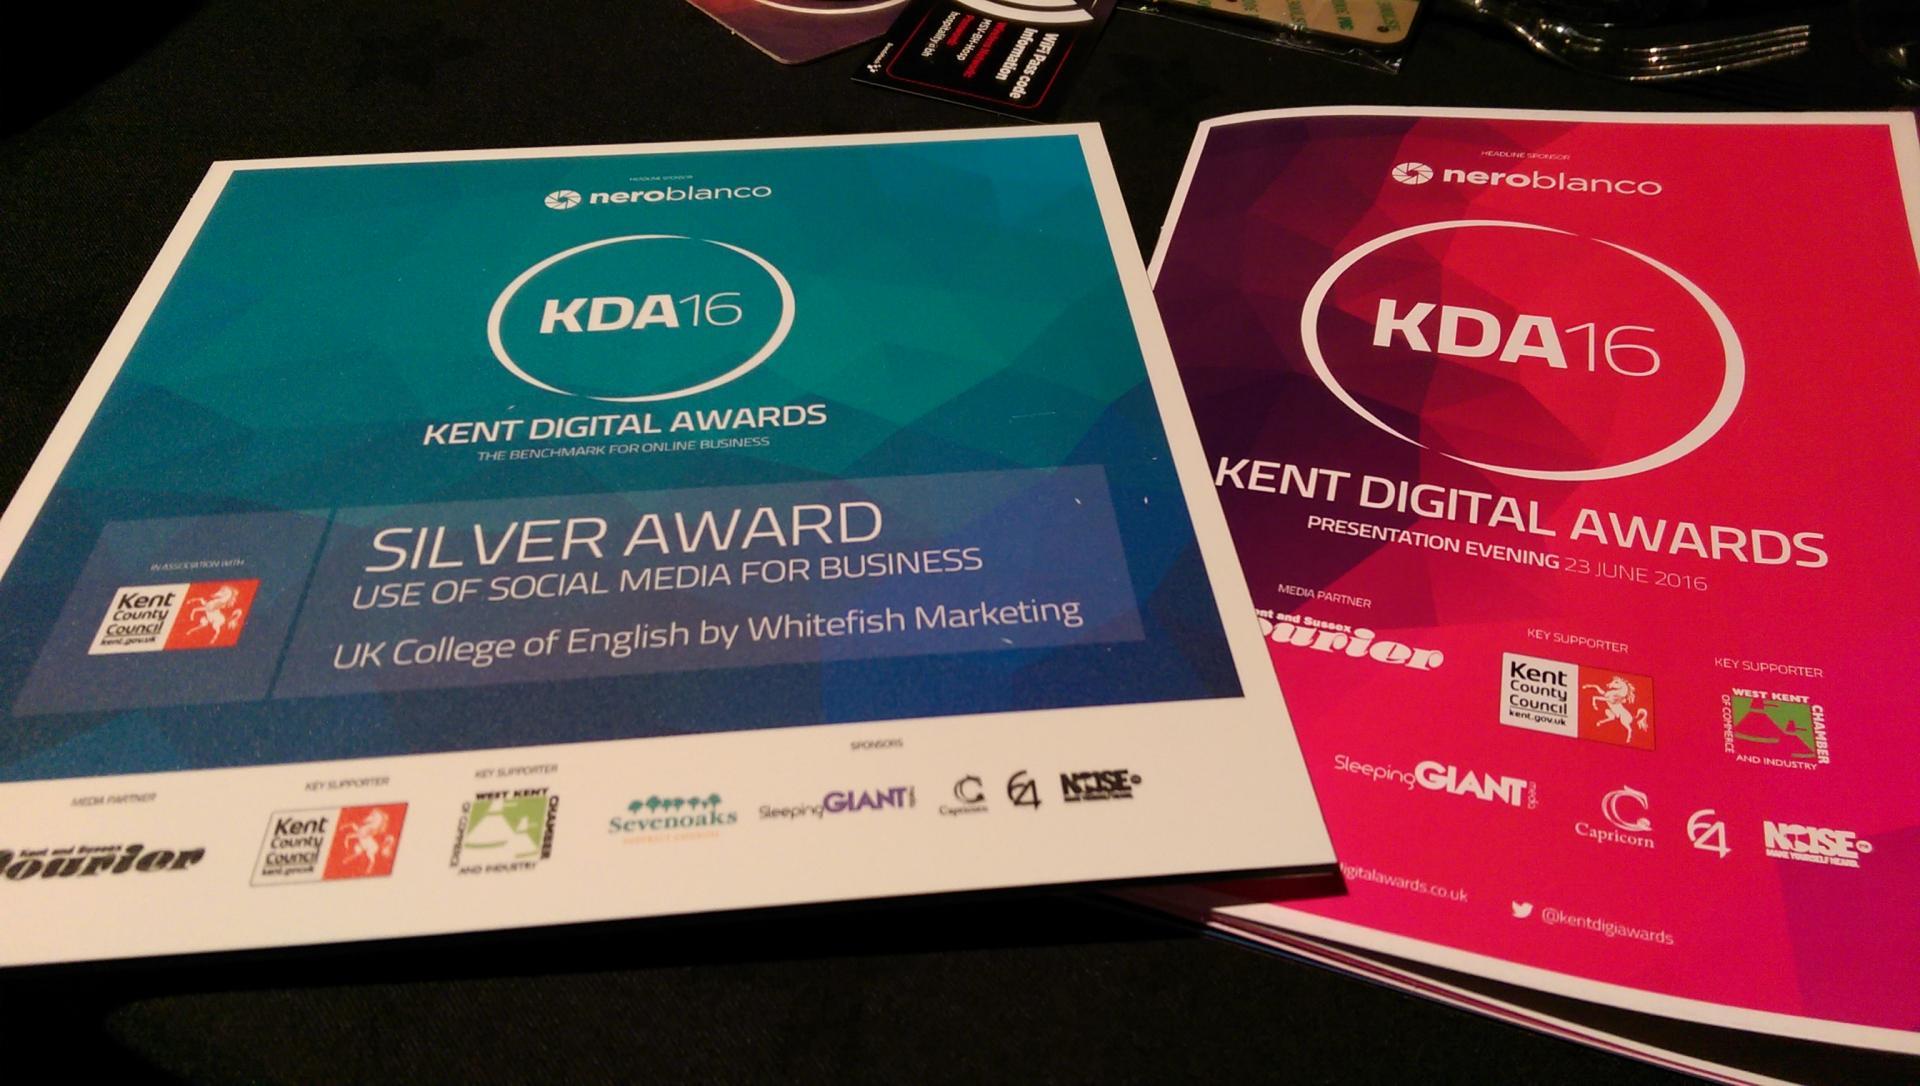 Sliver KDA 16 Award